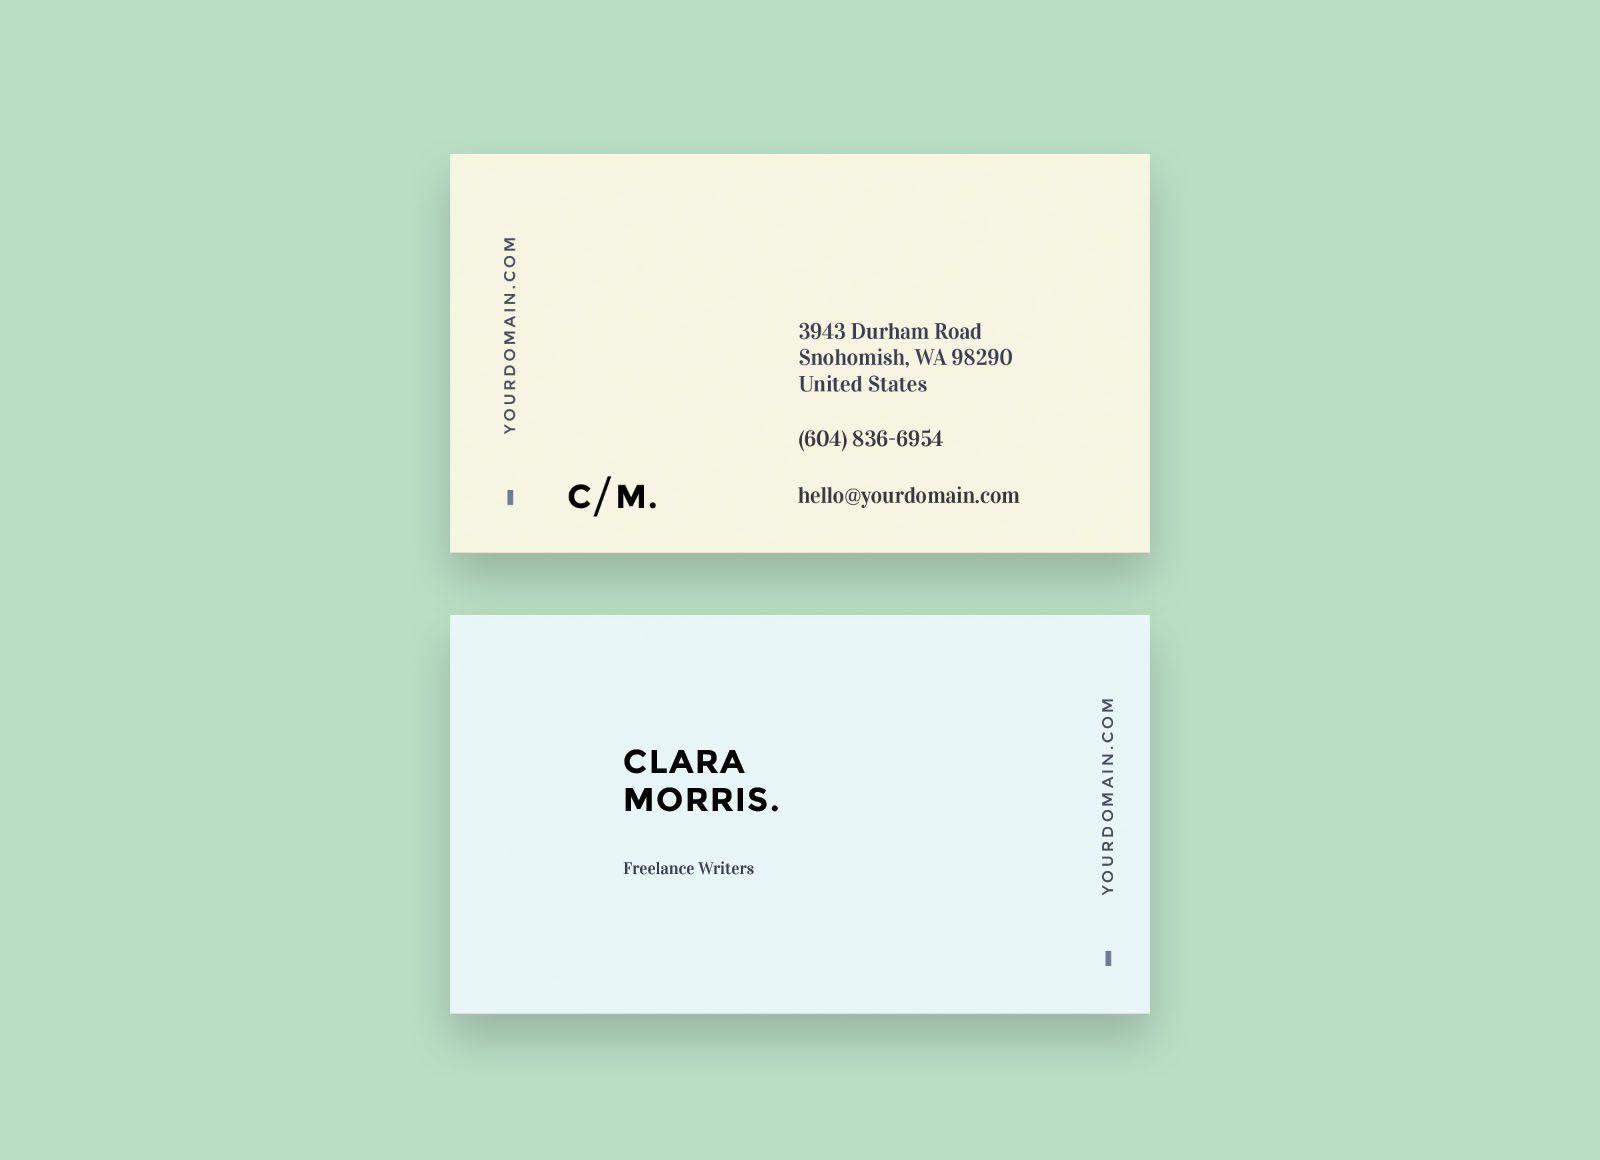 006 Excellent Minimalist Busines Card Template Free Sample  Minimal PsdFull